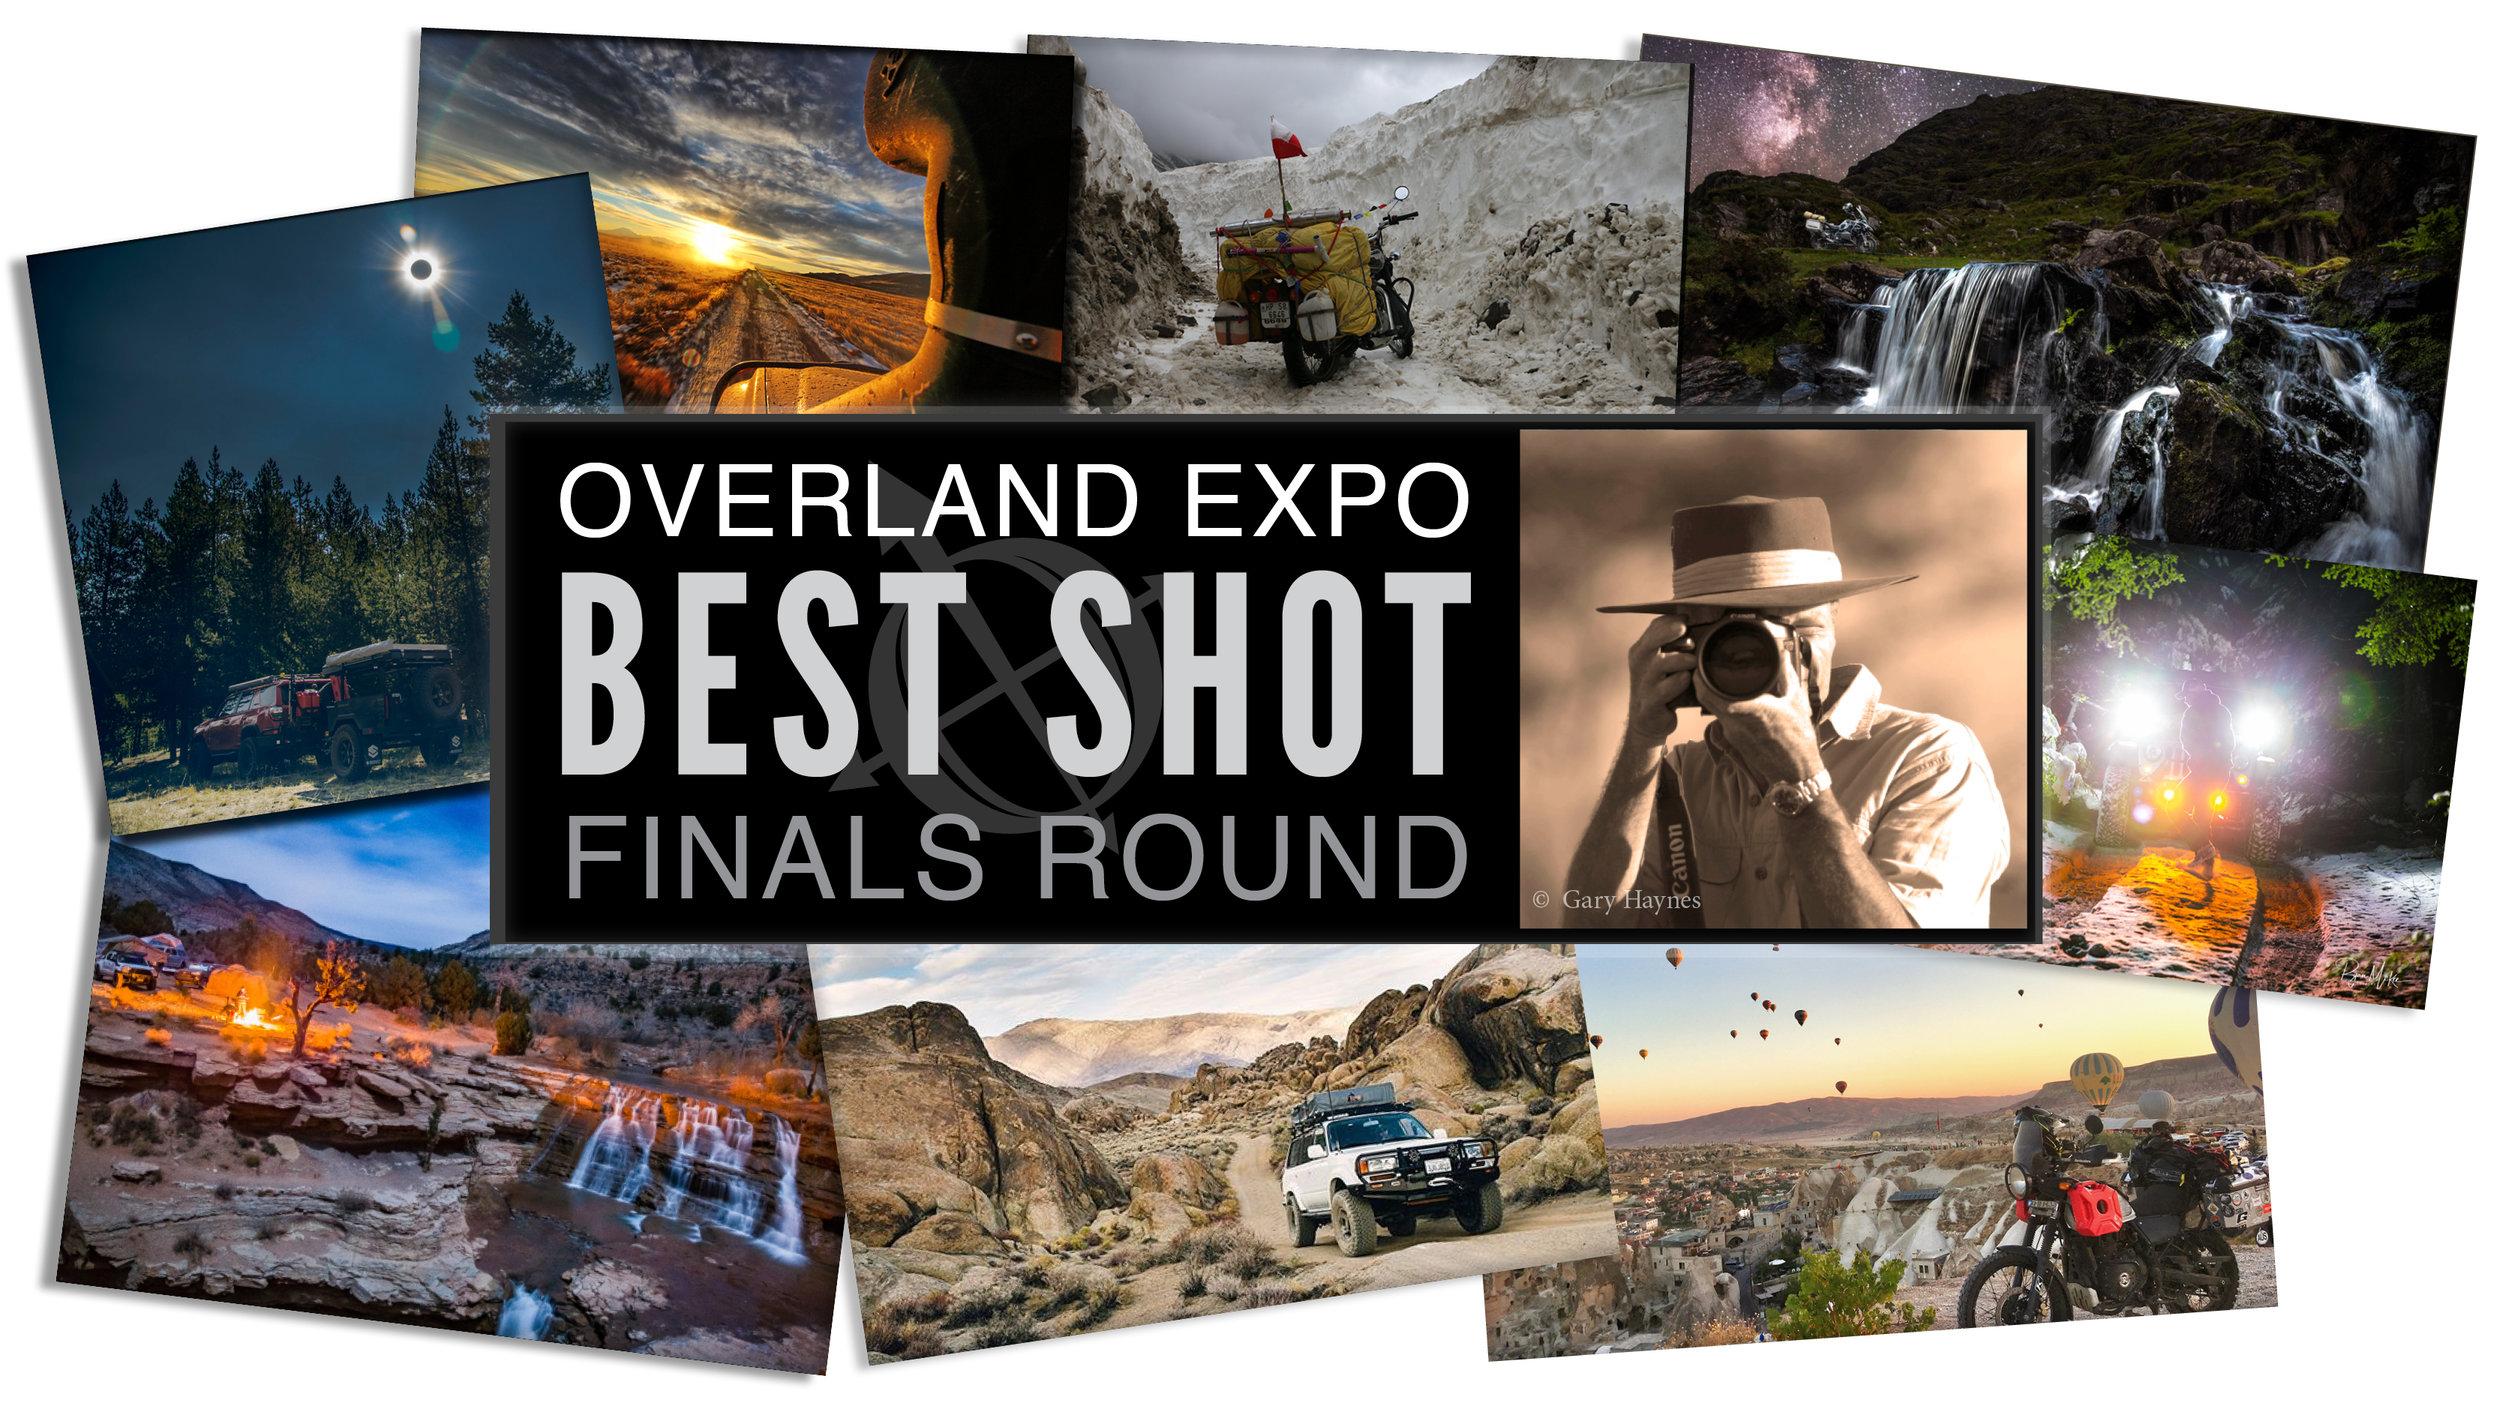 Best Shot 2018 Finalists (clockwise from upper left corner) : Isaac Marchionna, Maxterra, No to Sruuu, Tim Burke, Ryan McKee, Abijith Rao, dirt_road_travels, Austin King